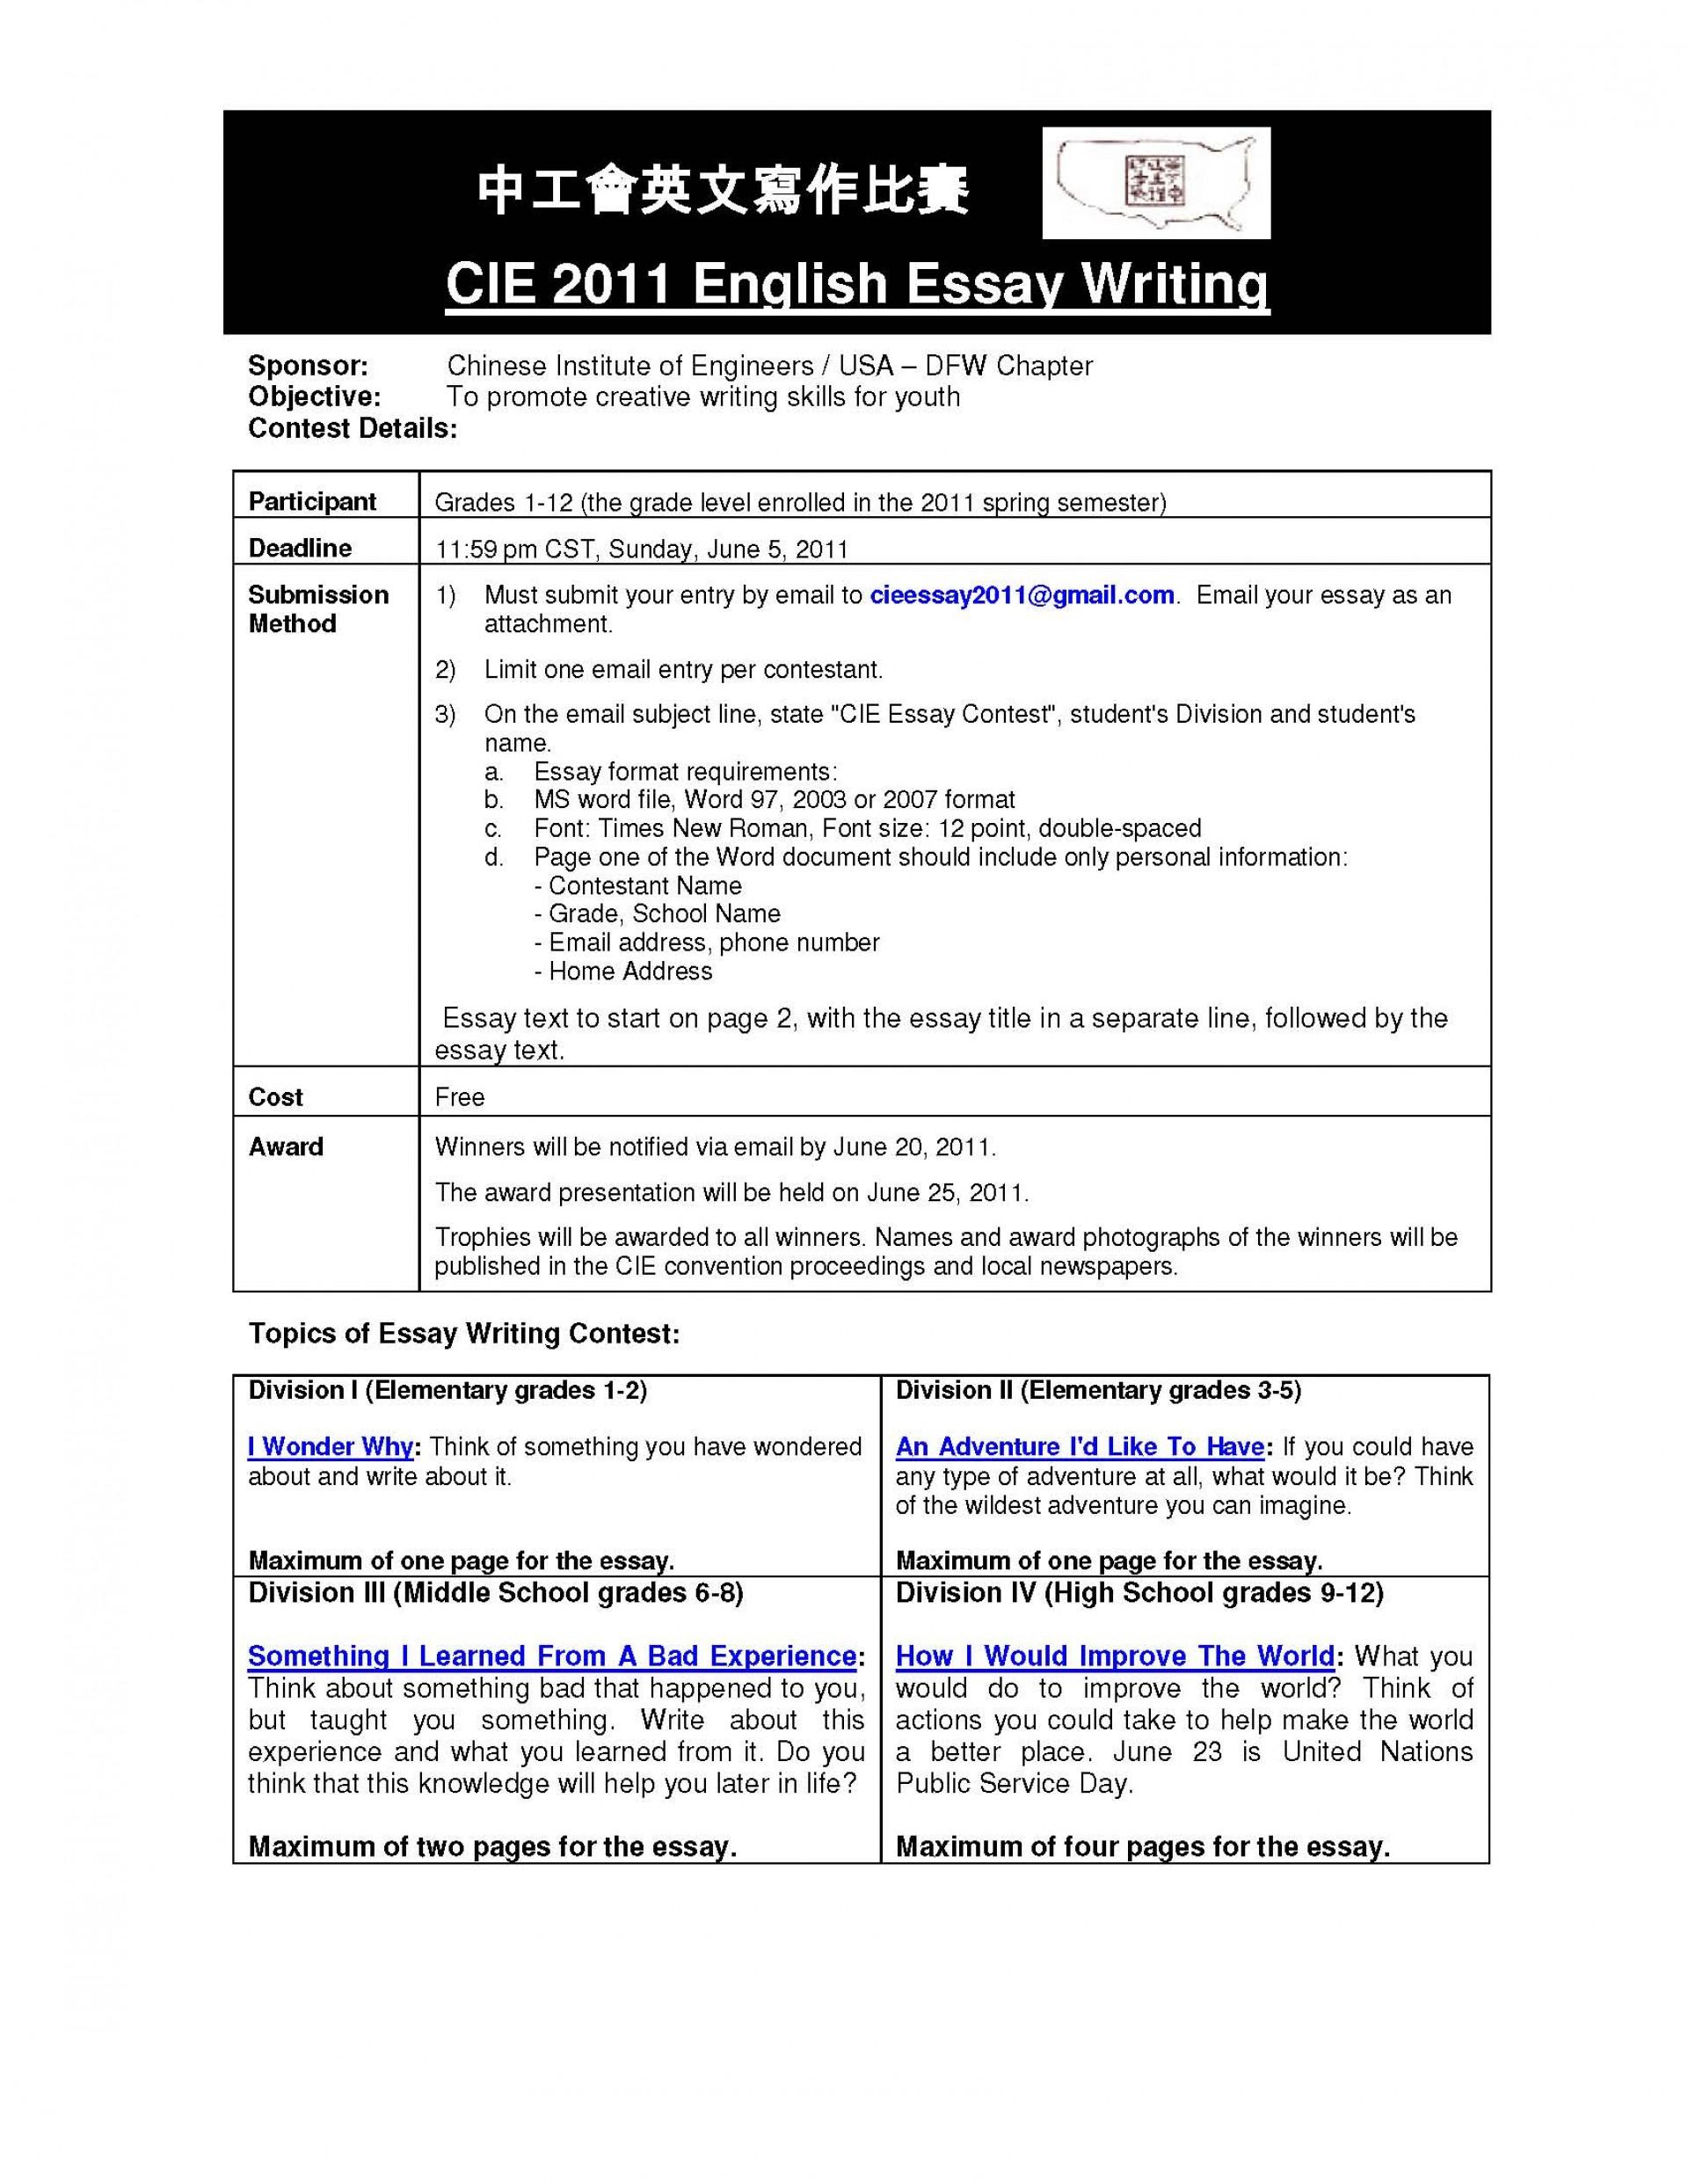 007 Essay Example Flyer Free Writing Shocking Service Draft Online Uk 1920